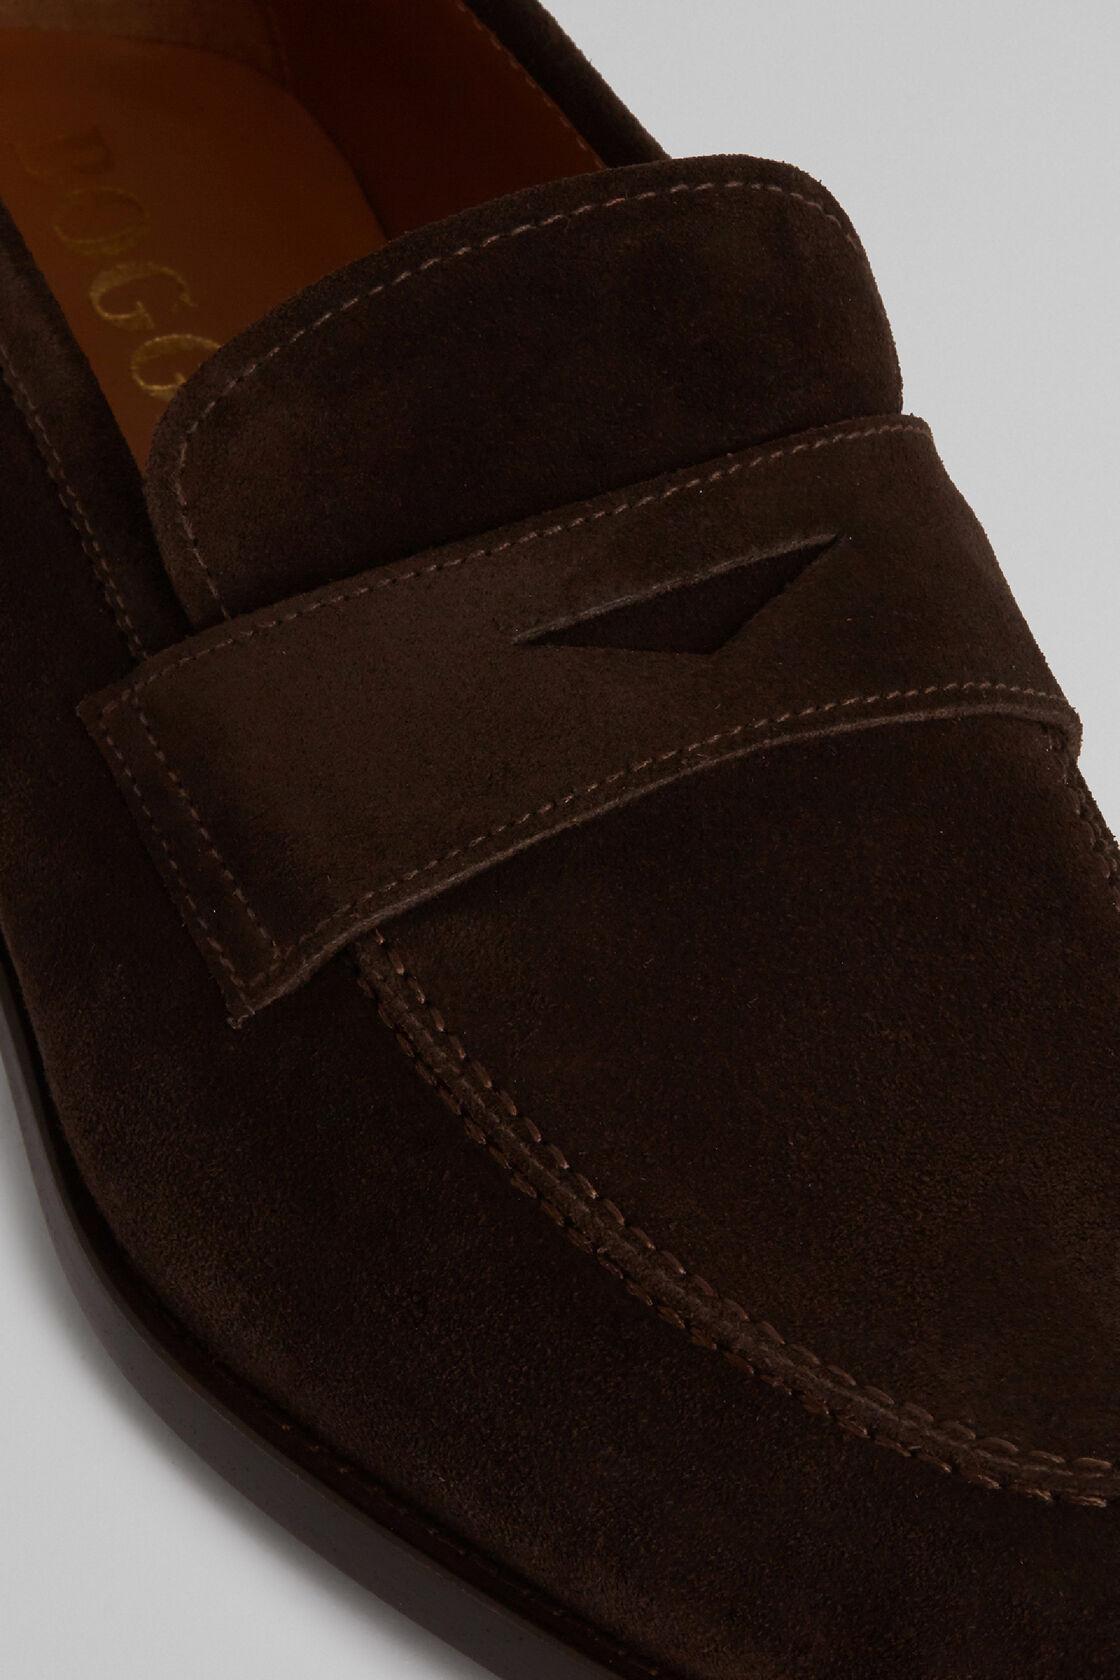 Suede Penny Loafers, Dark brown, hi-res